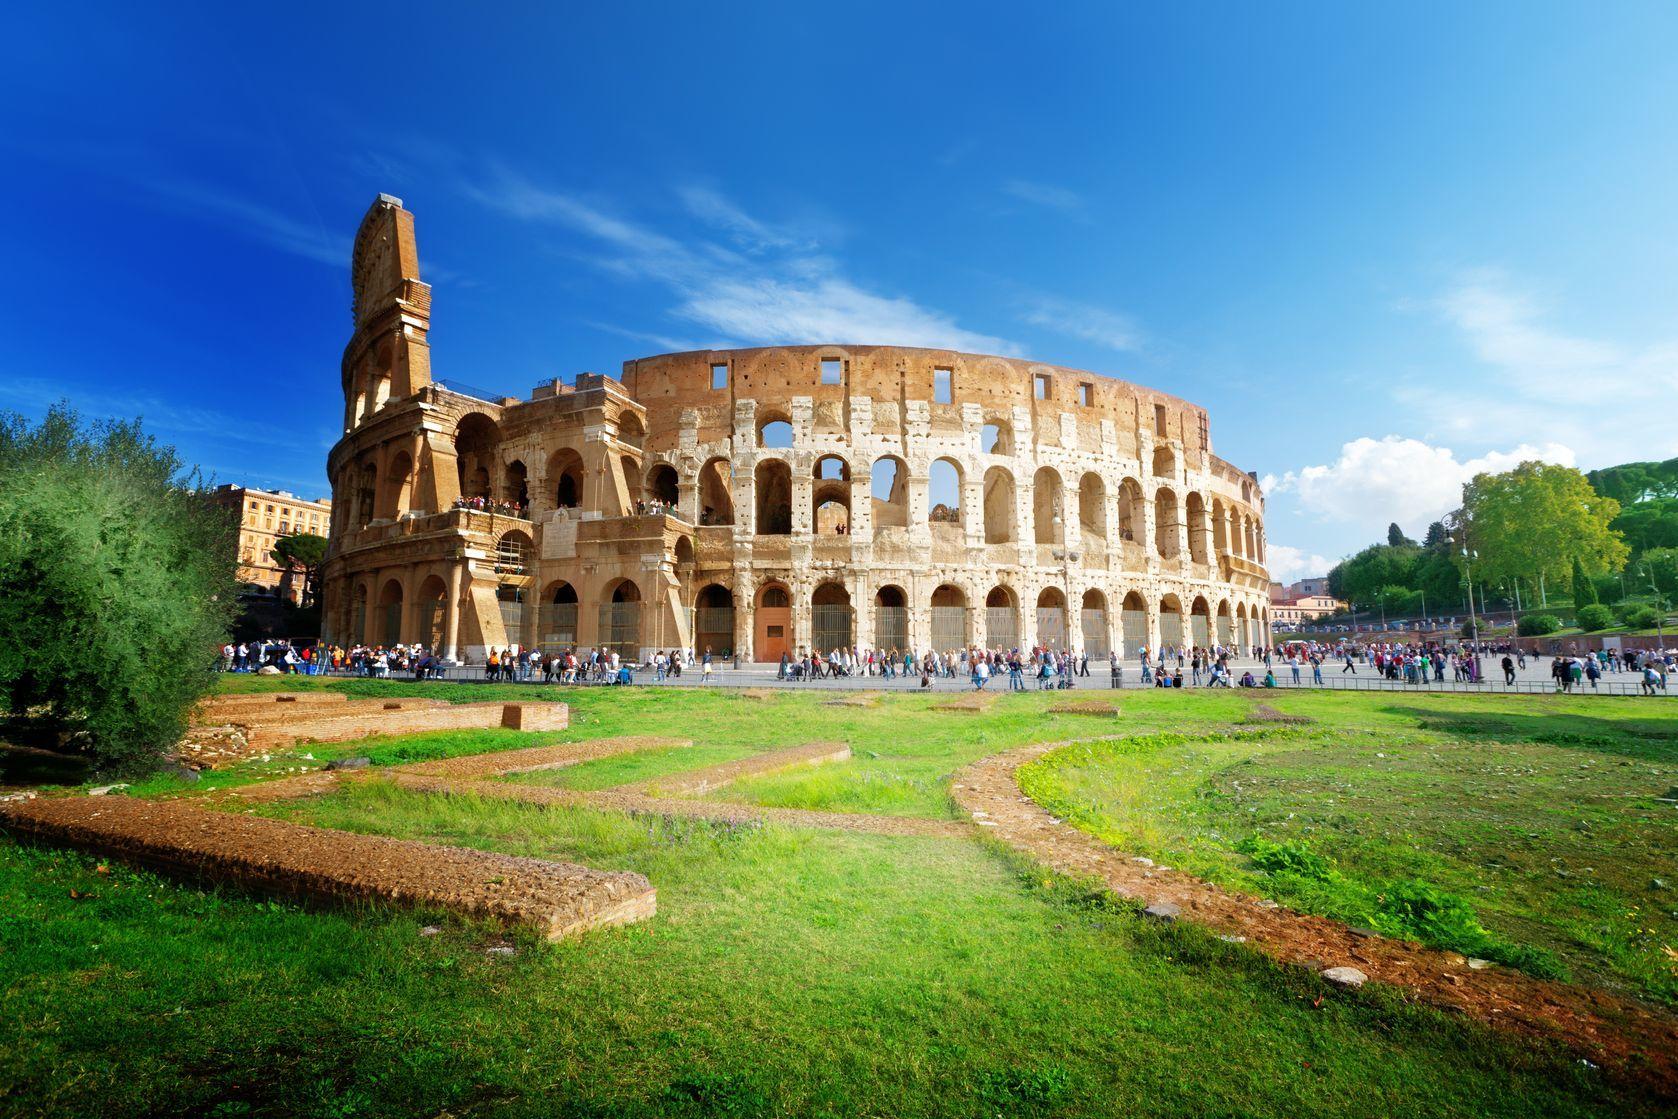 Koloseum v italském Římě | iakov/123RF.com